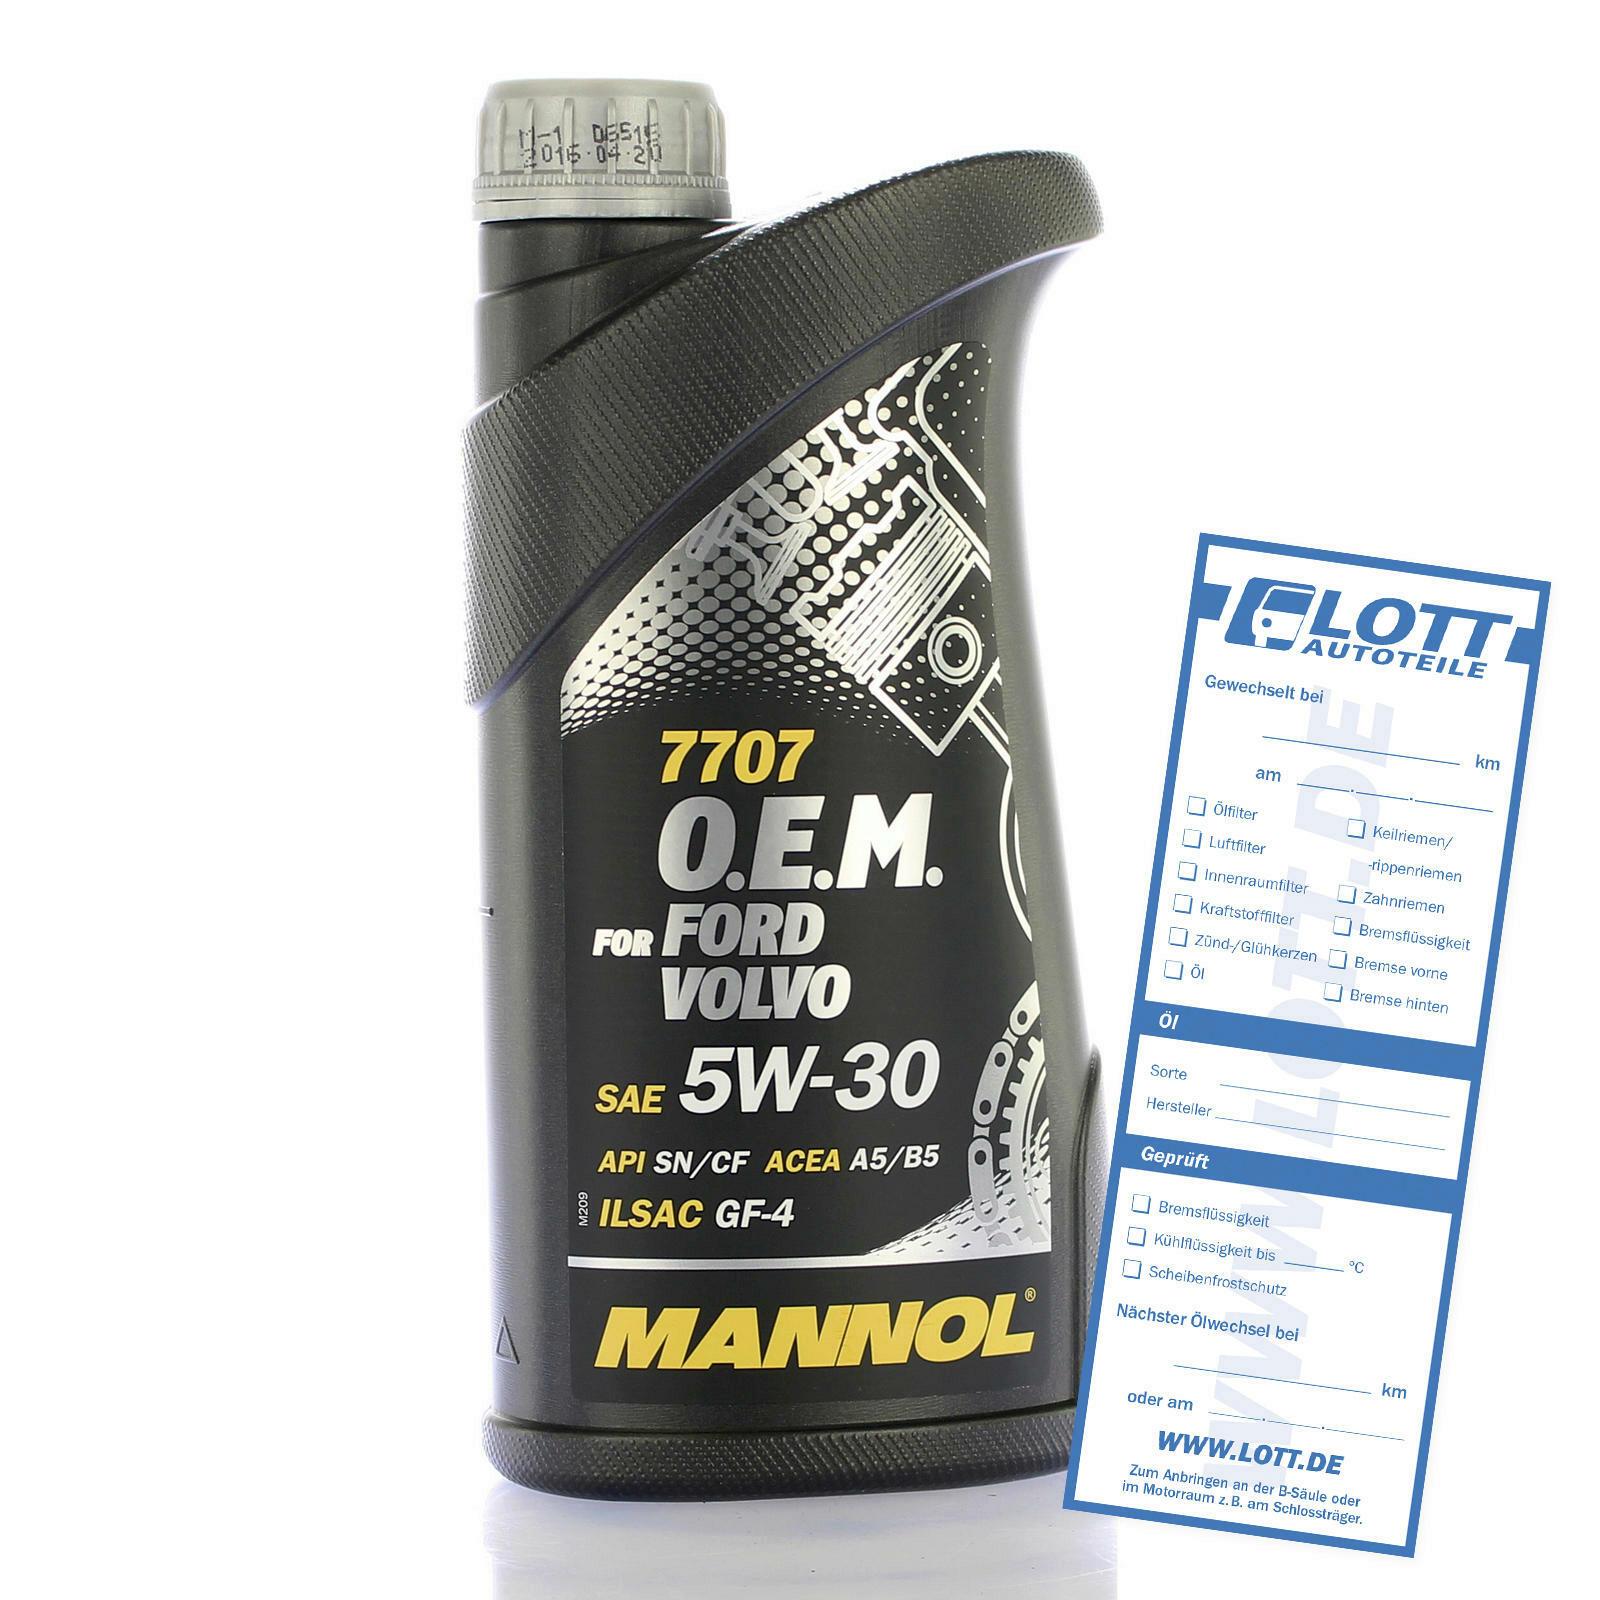 MANNOL MN7707-1 O.E.M. 5W-30 1 Liter